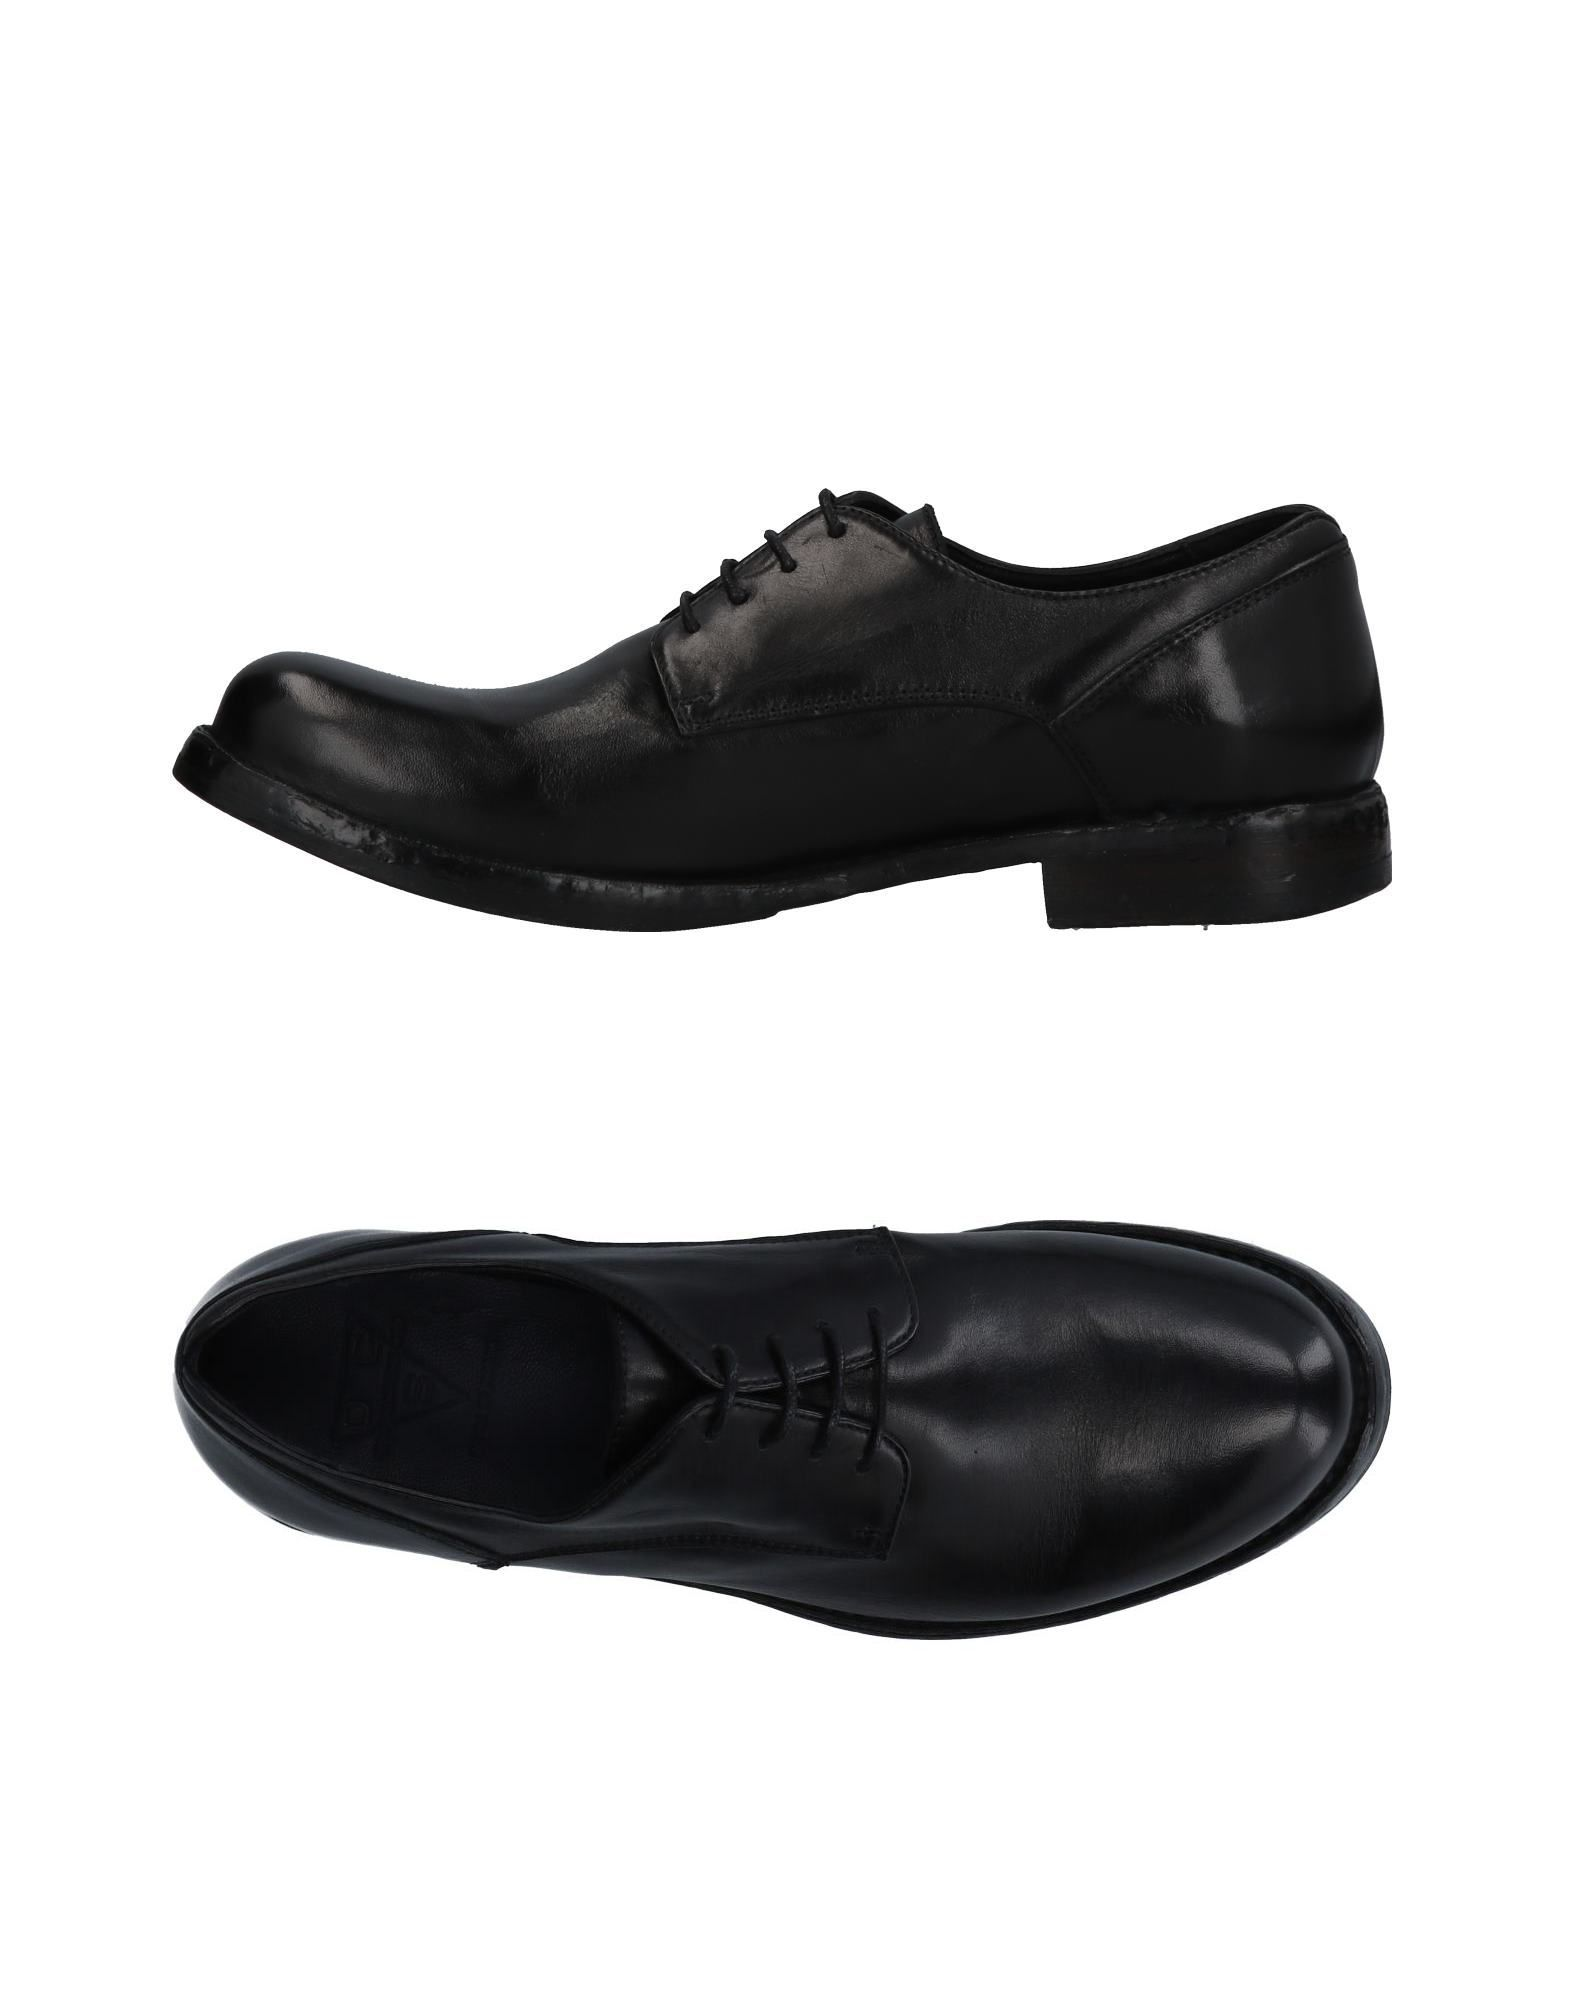 CHAUSSURES - Chaussures à lacetsVerdelli ZxjhCo